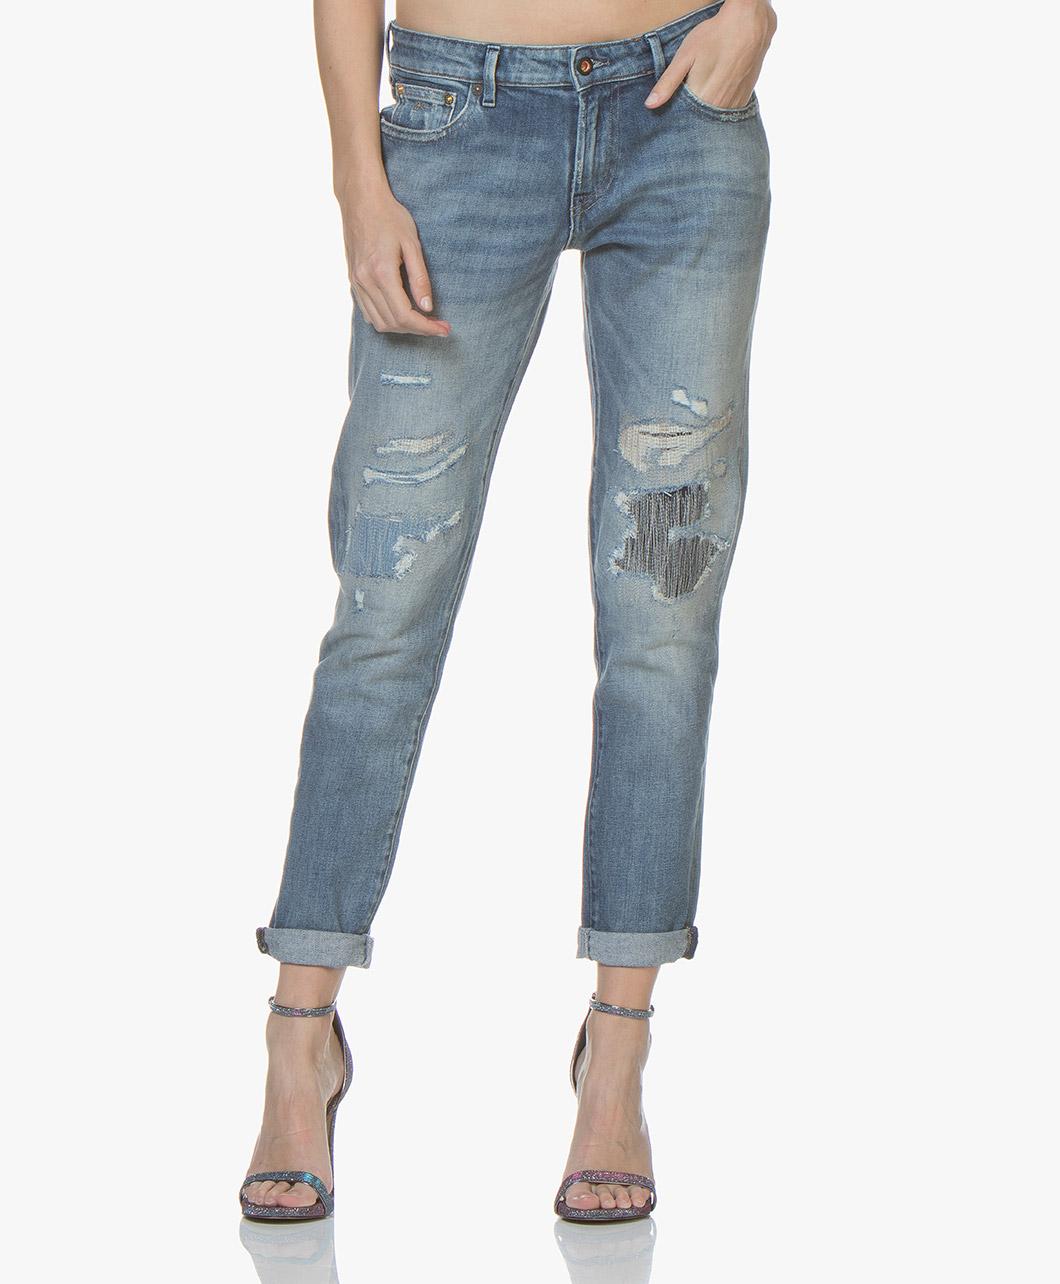 Afbeelding van Denham Jeans Medium Blauw Monroe Girlfriend Fit